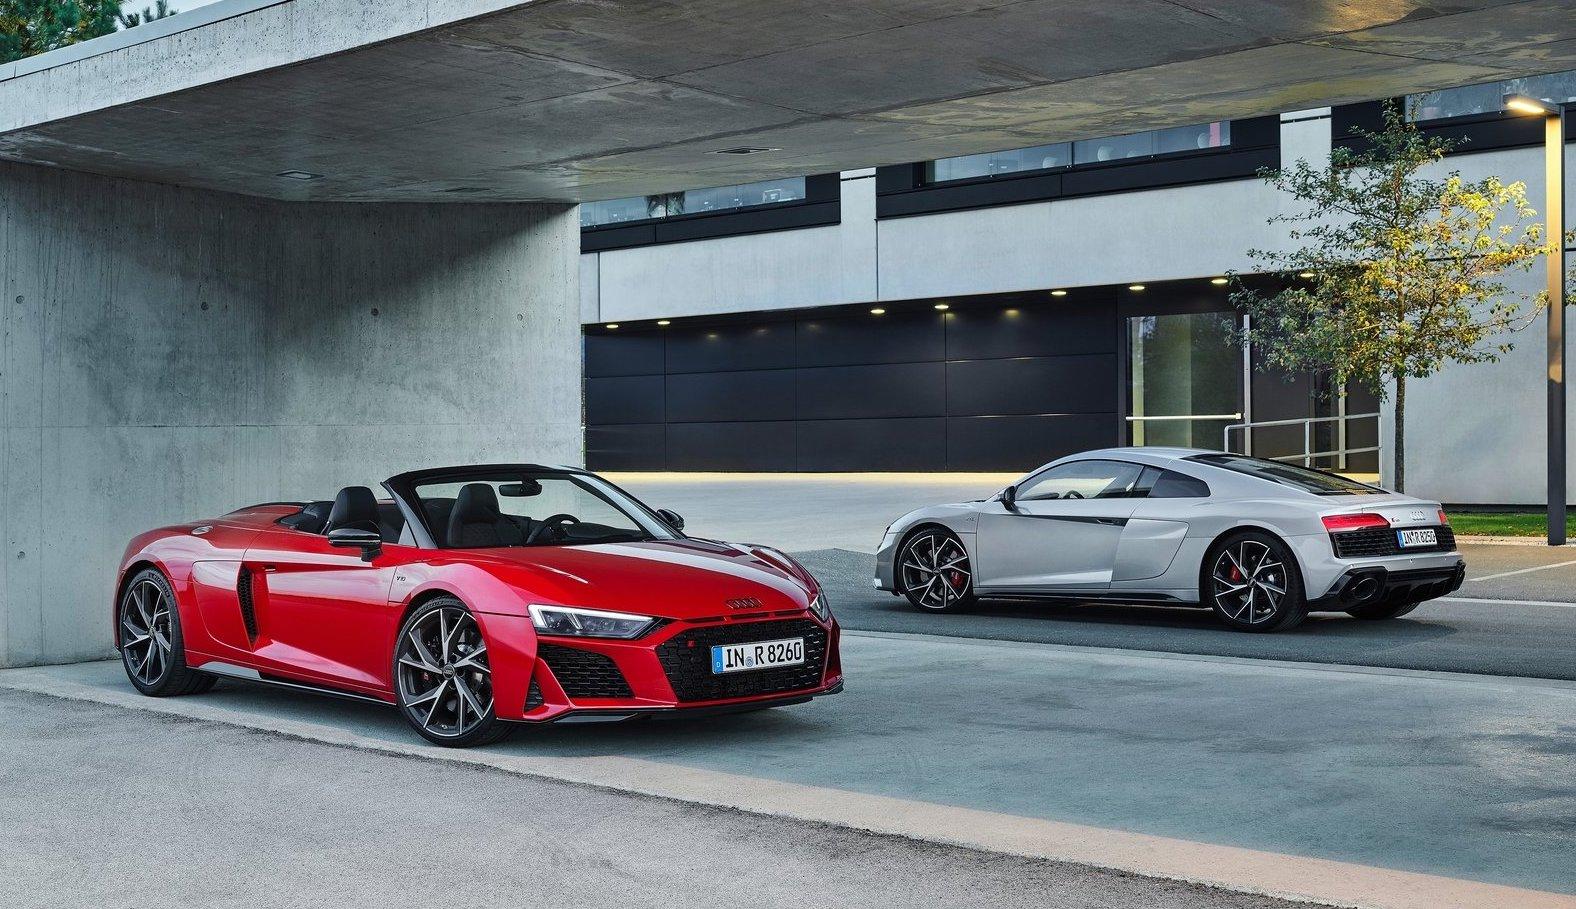 2020 Audi R8 V10 Rwd Revealed Becomes Permanent Model Performancedrive